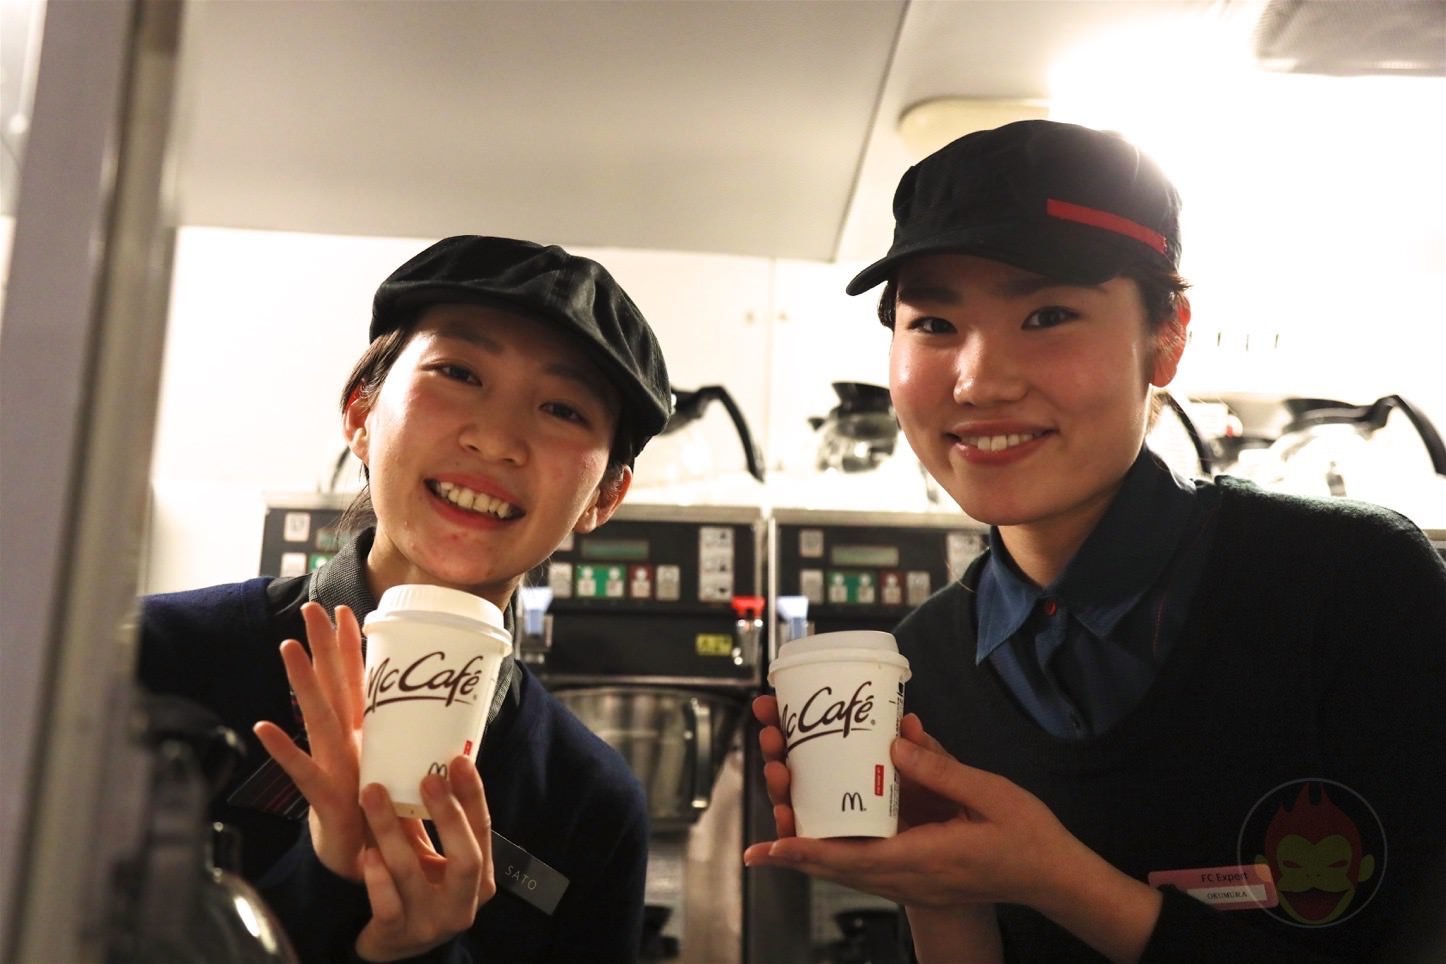 McDonalds-New-Coffee-2017-01.jpg